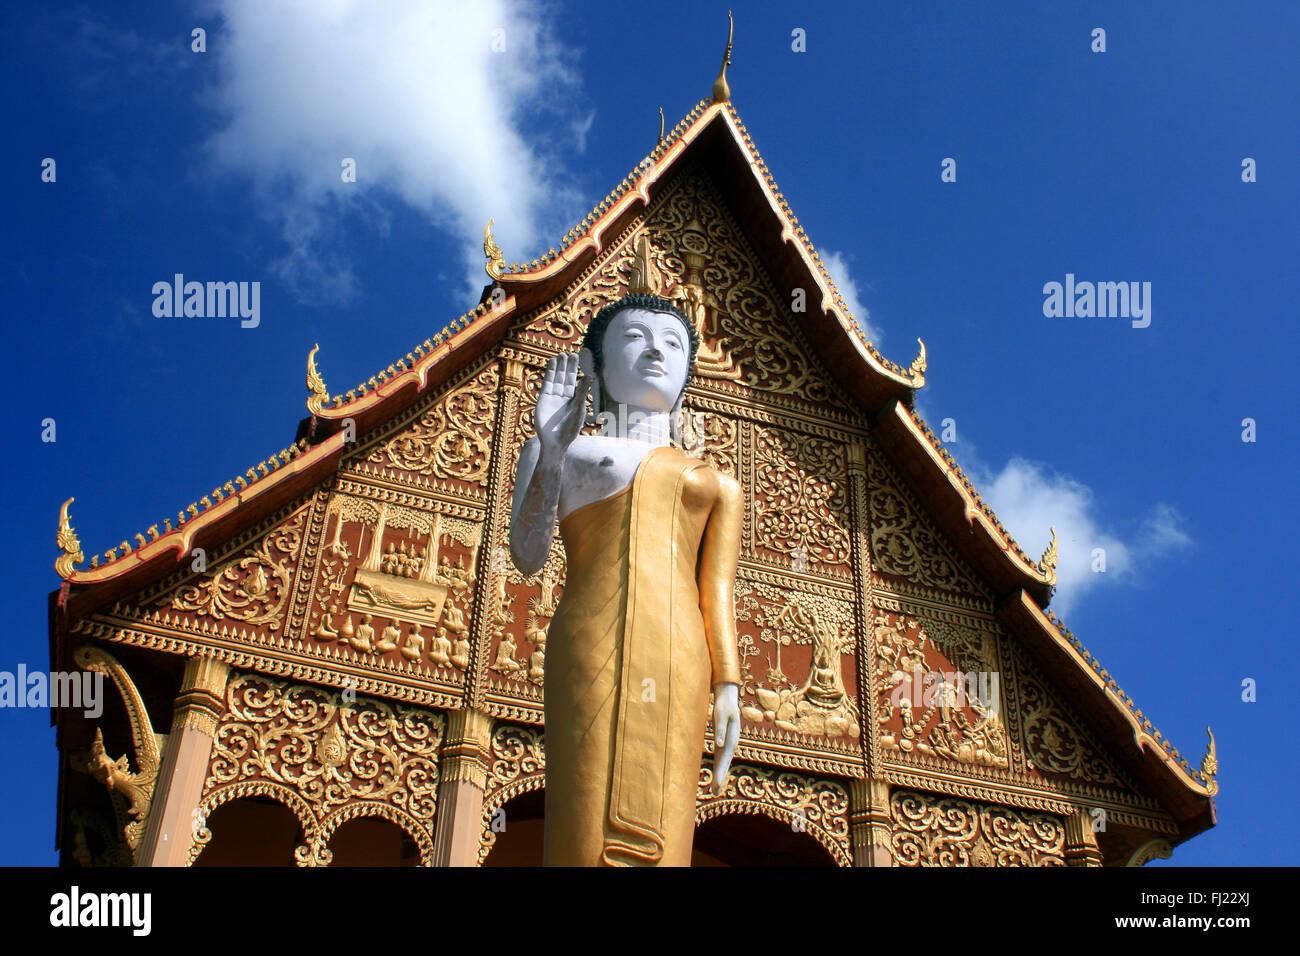 Buddhist architecture at Wat Xieng Thong, Luang Prabang - Stock Image